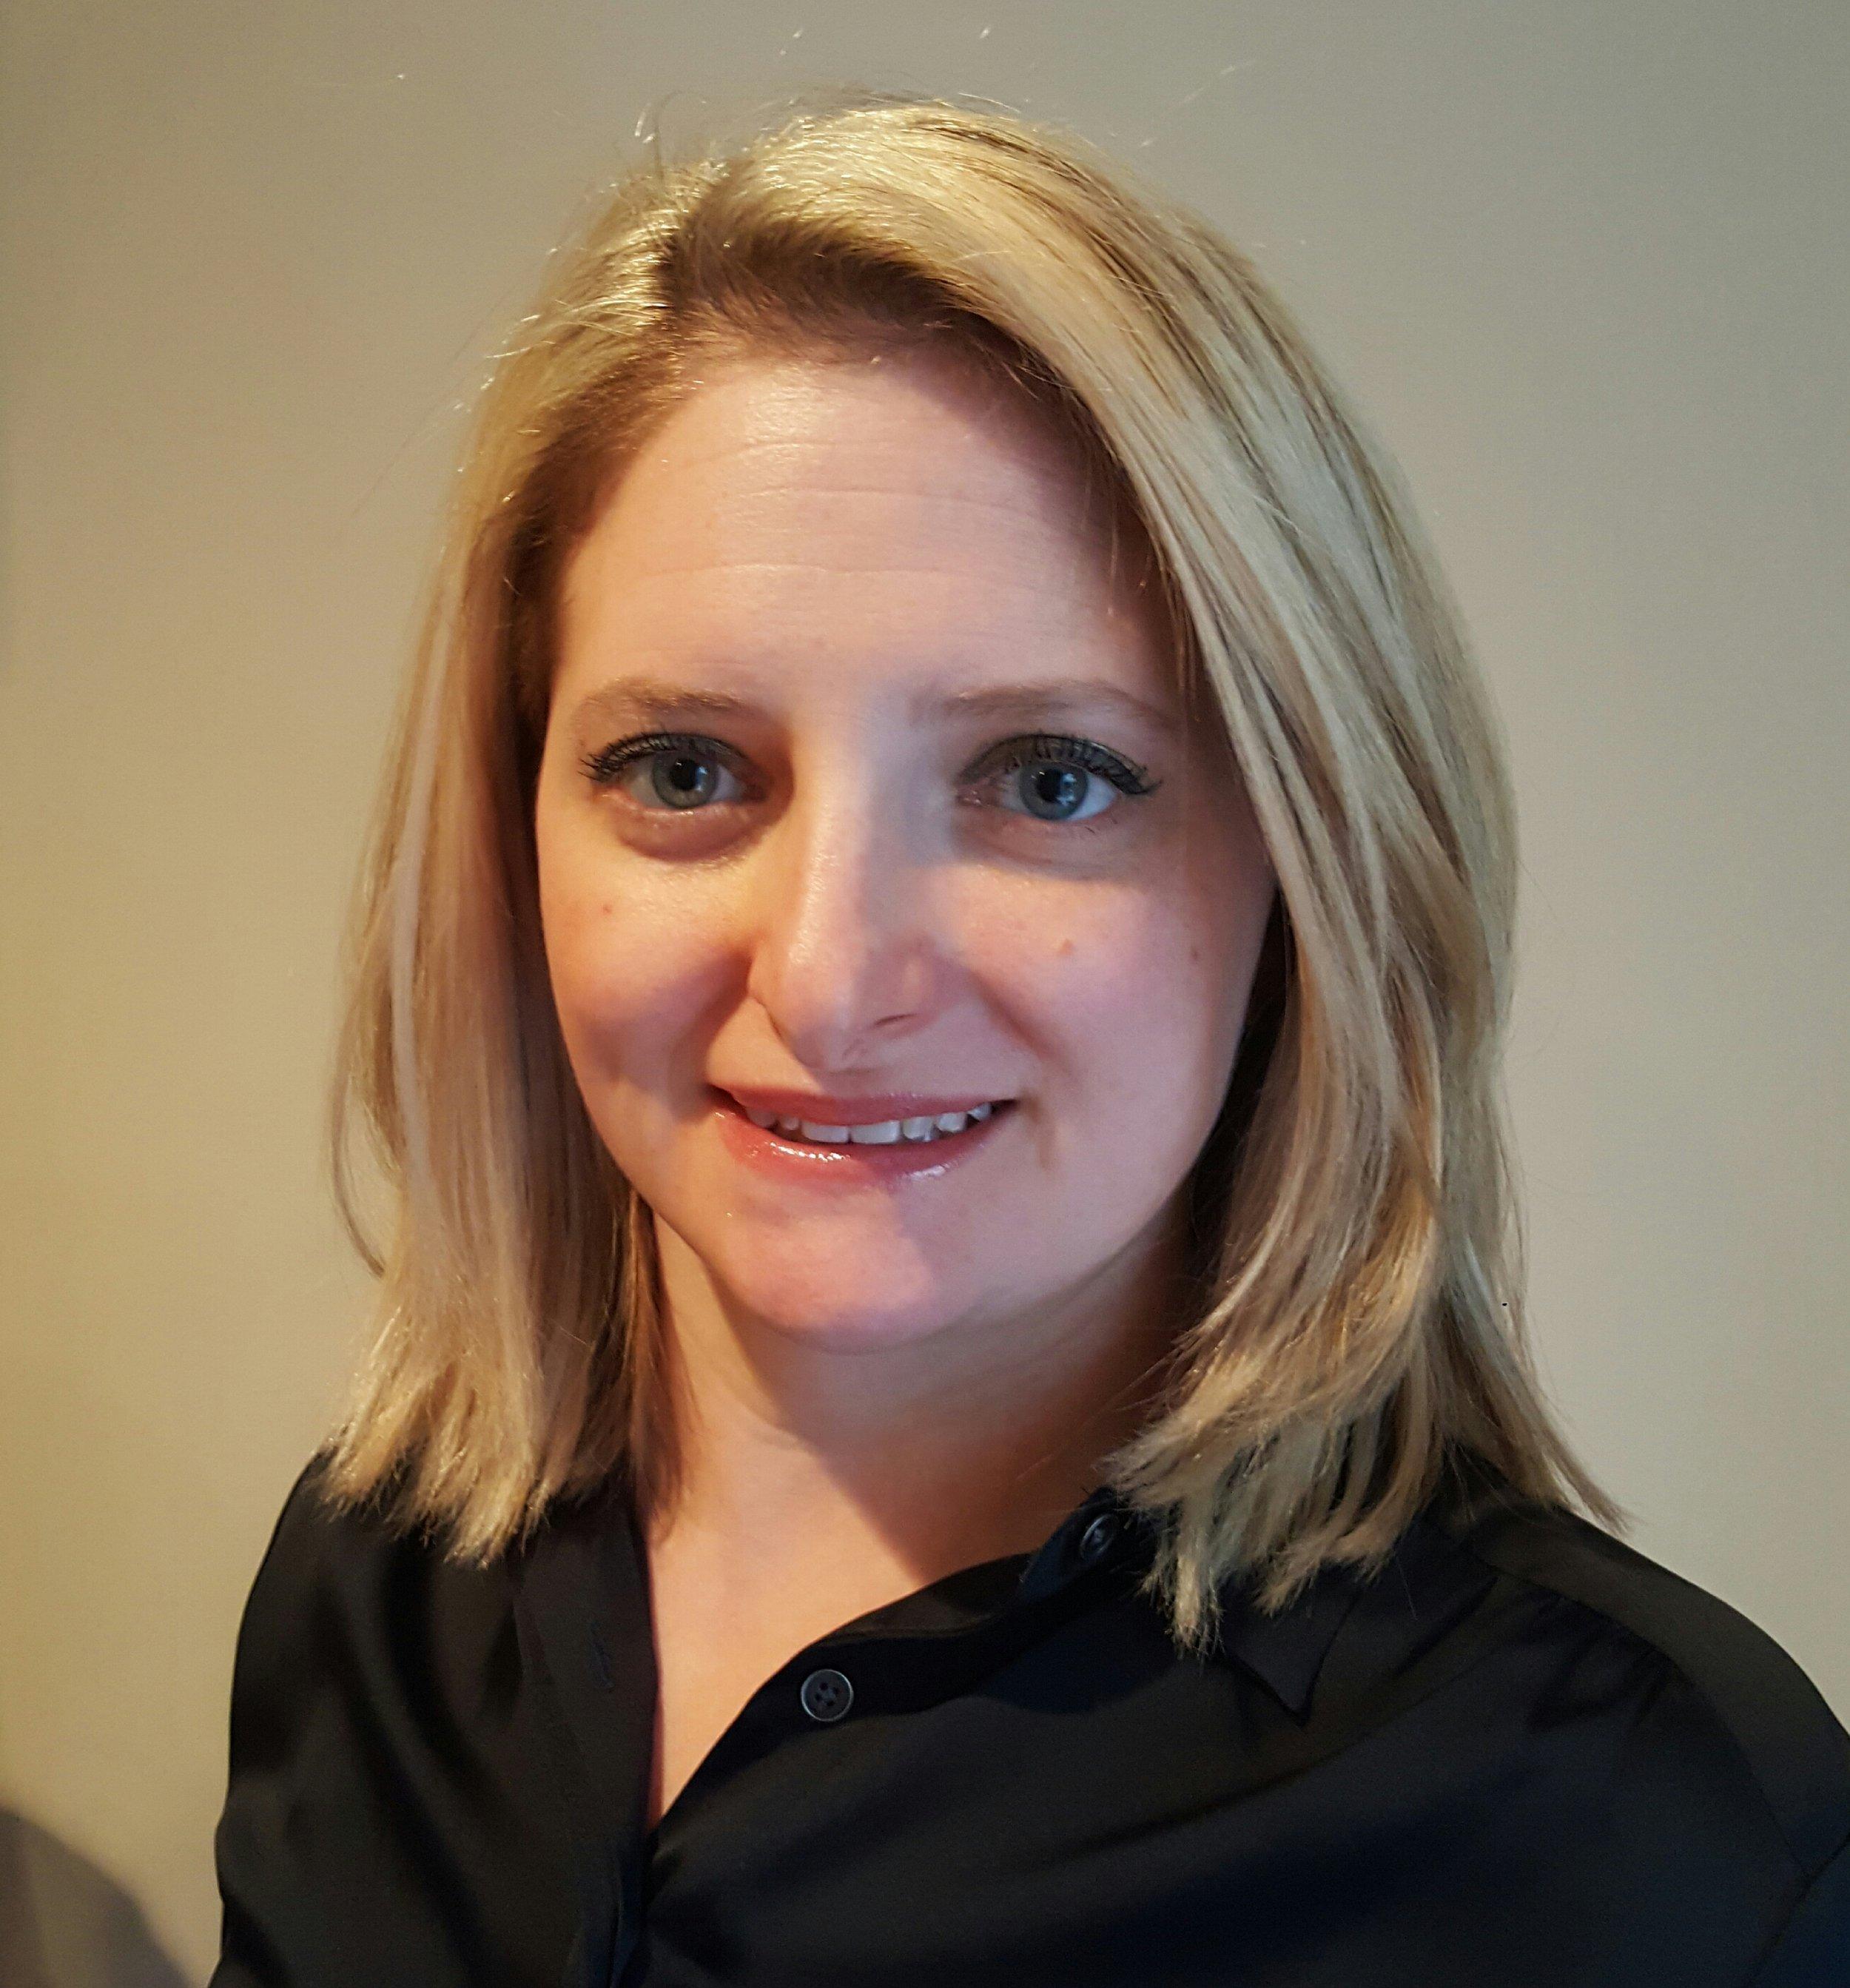 Erica Meyrich-Pinciss - Research & Insights Specialist